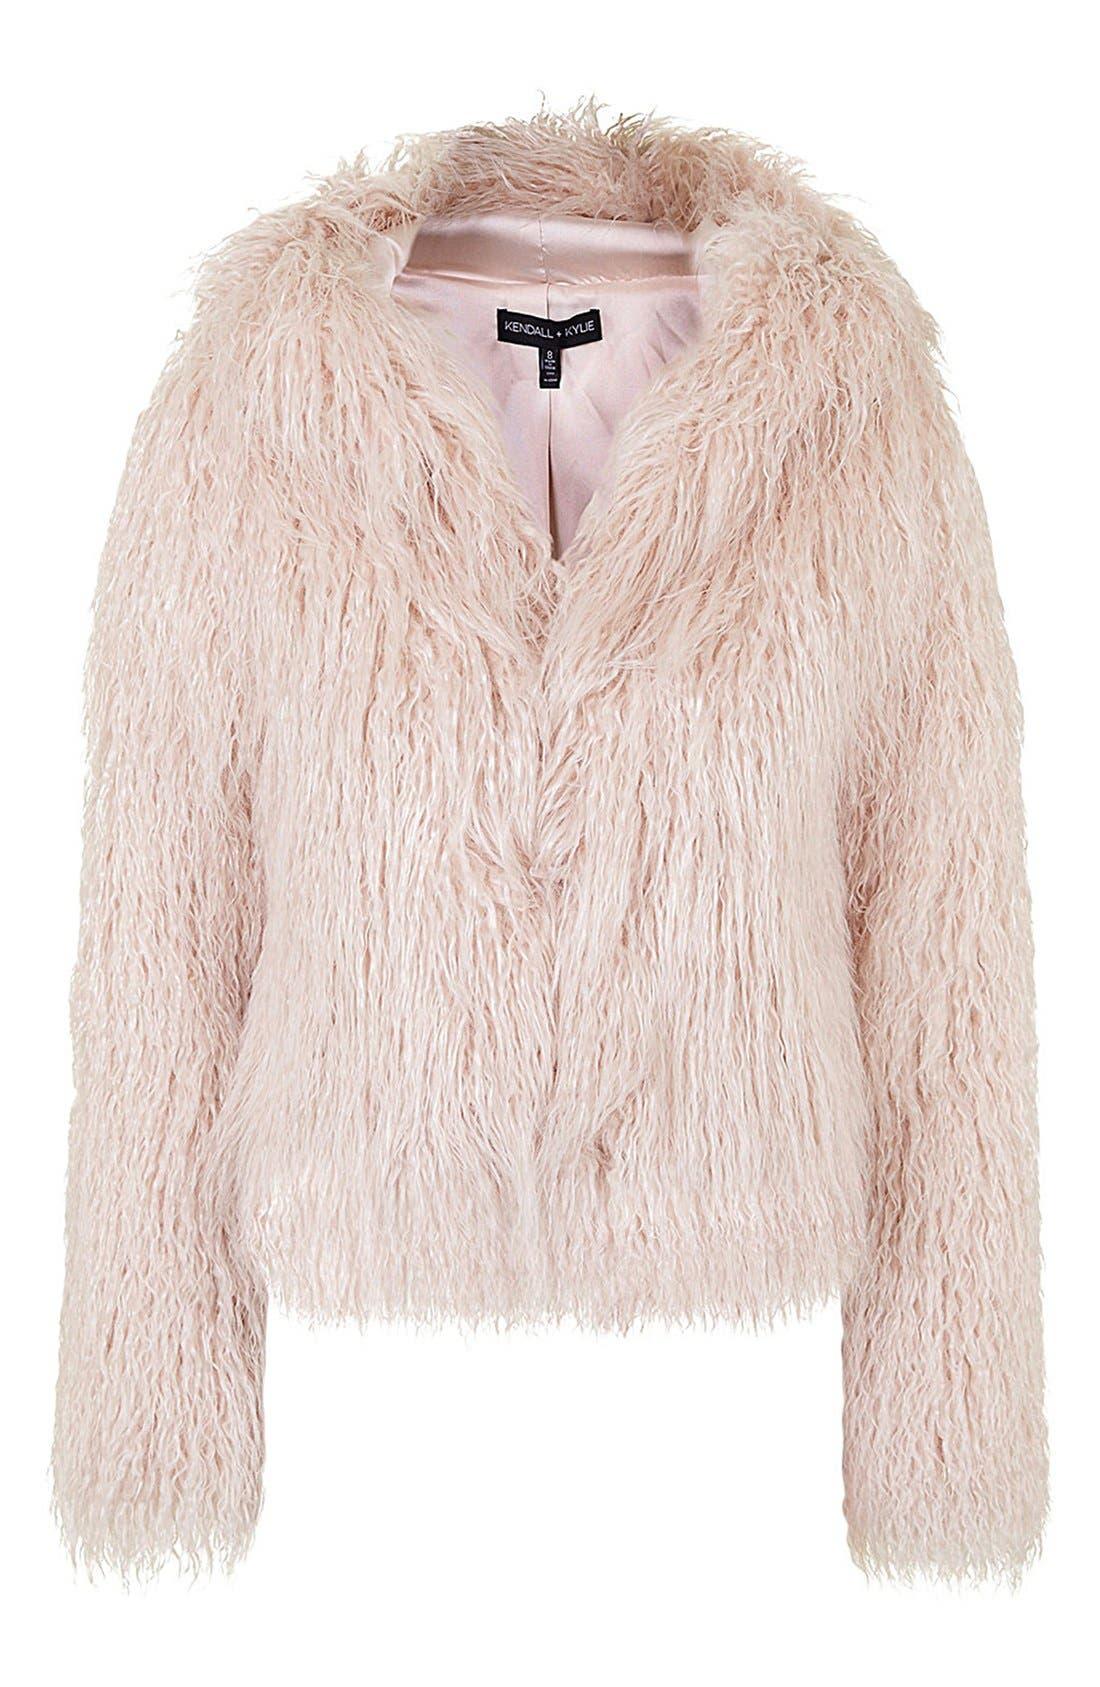 ,                             KENDALL + KYLIE at Topshop Faux Fur Coat,                             Alternate thumbnail 3, color,                             650